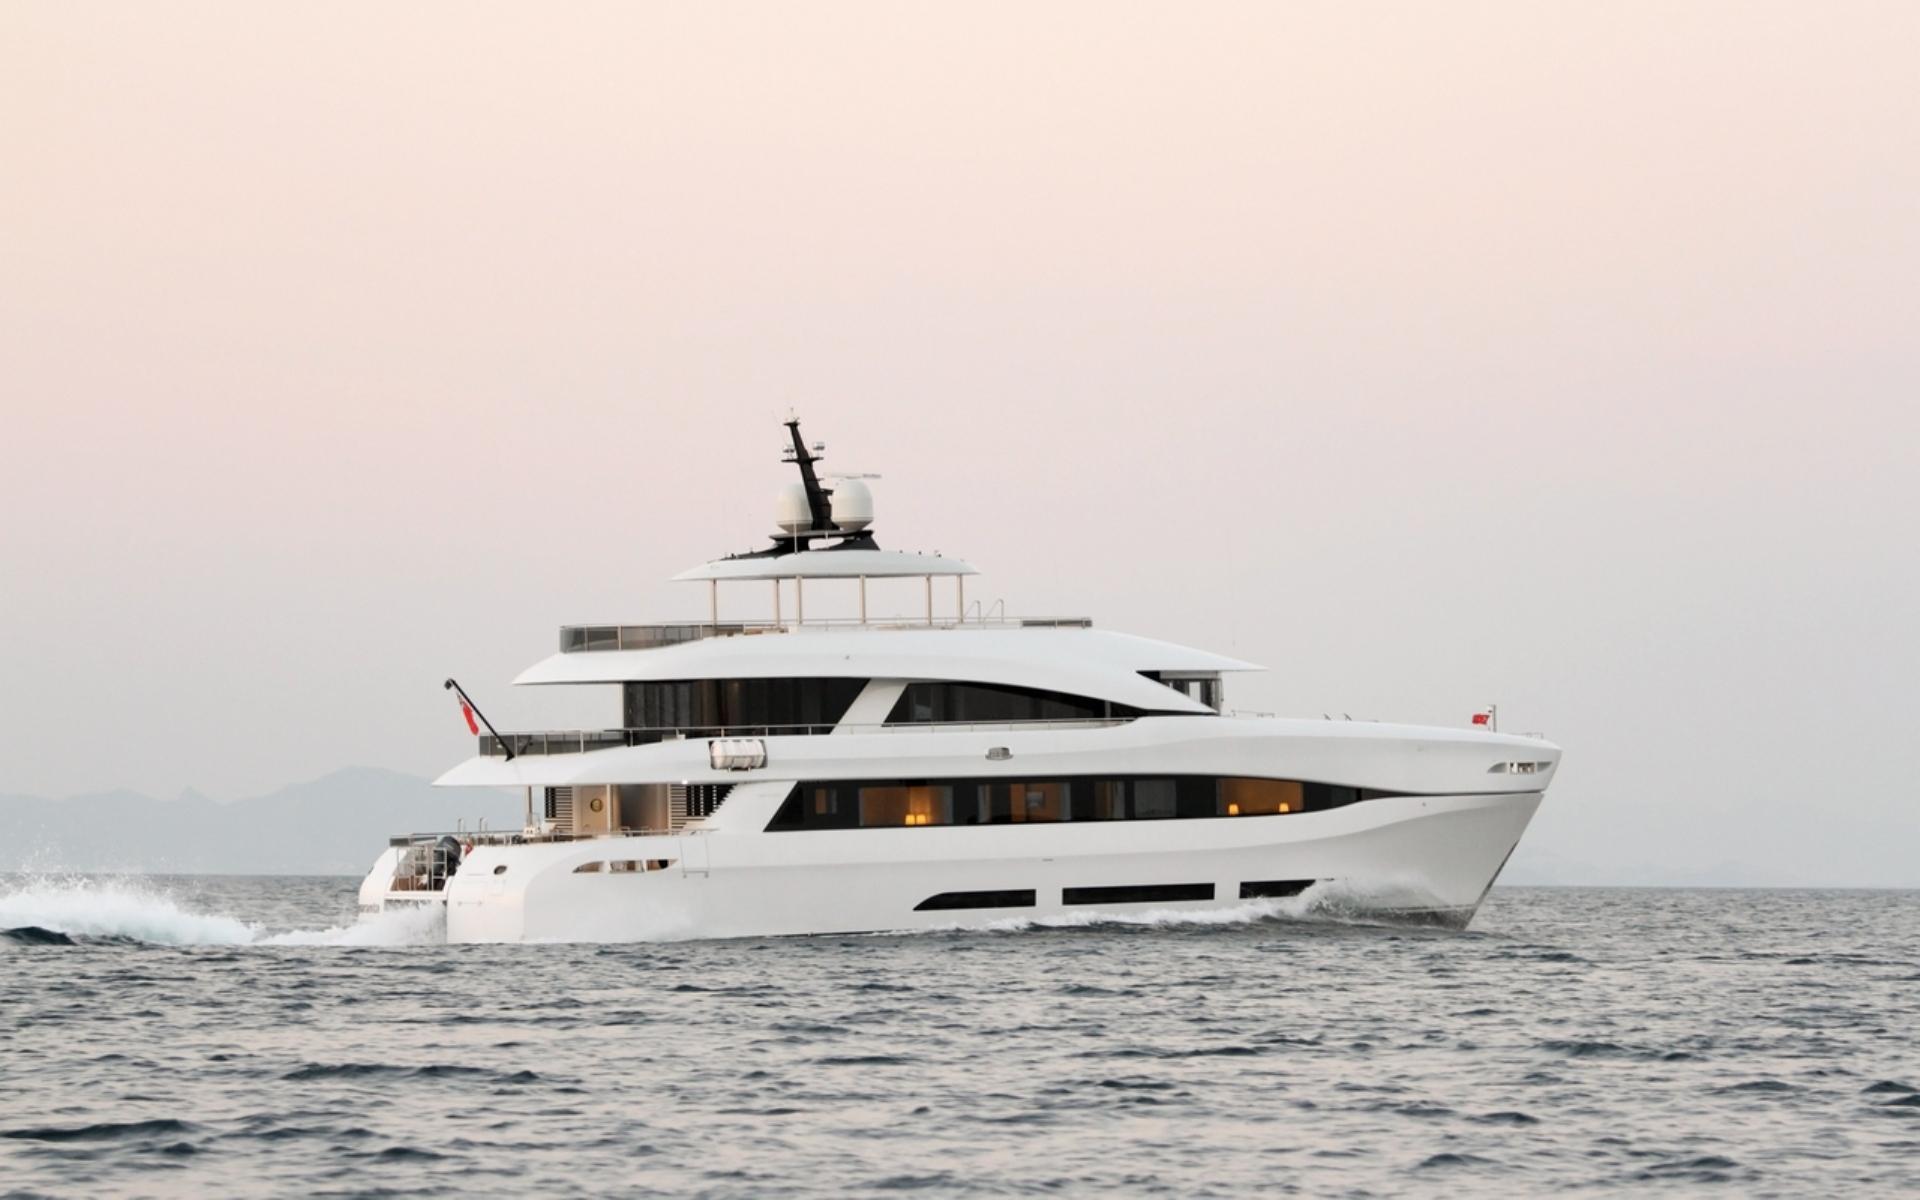 Curvelle Quaranta 34M Maxi Power Catamaran